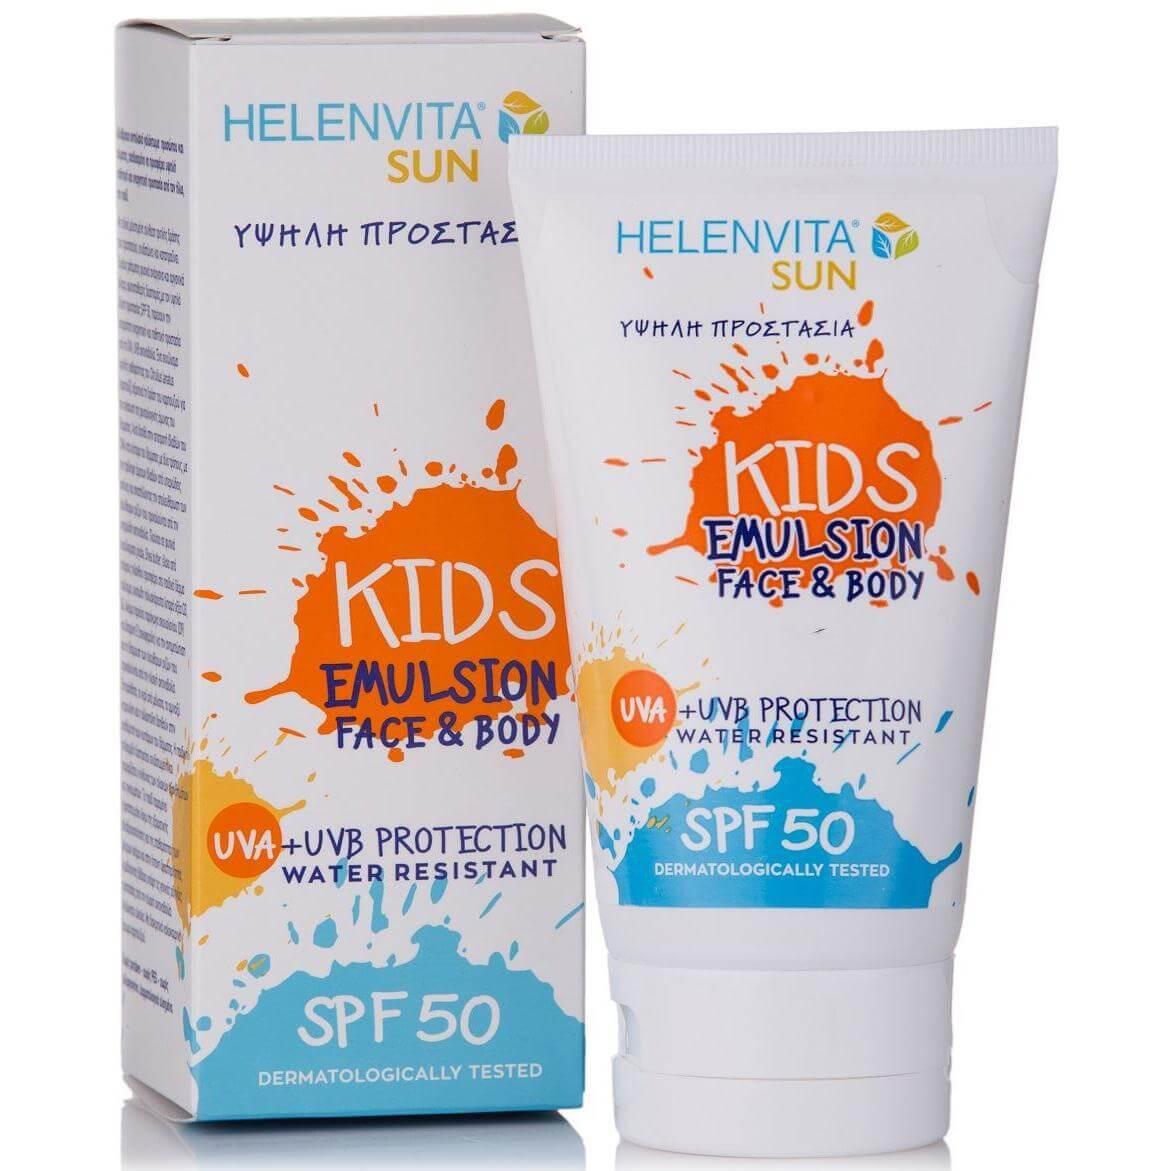 Helenvita Sun Kids Face & Body Emulsion Spf50 Παιδικό Αδιάβροχο Aντηλιακό Γαλάκτωμα Προσώπου-Σώματος Υψηλής Προστασίας 150ml